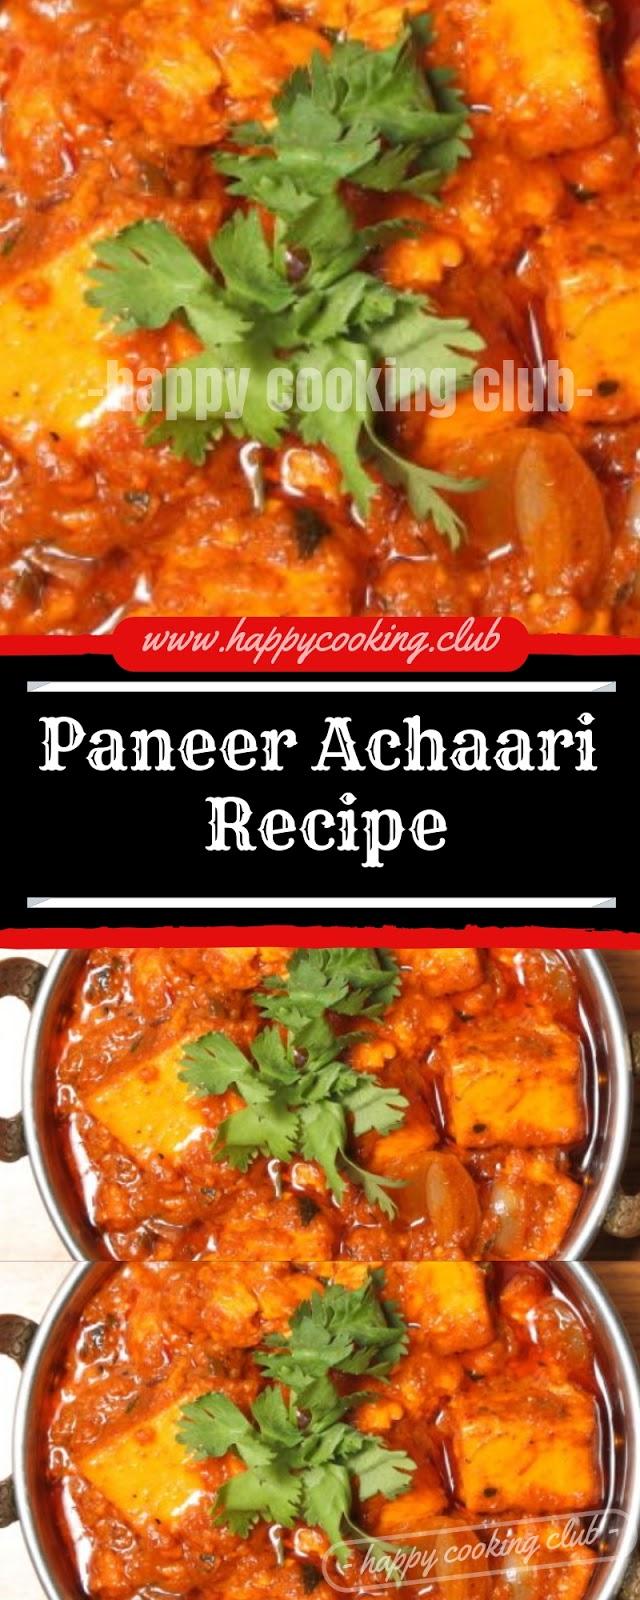 Paneer Achaari Recipe